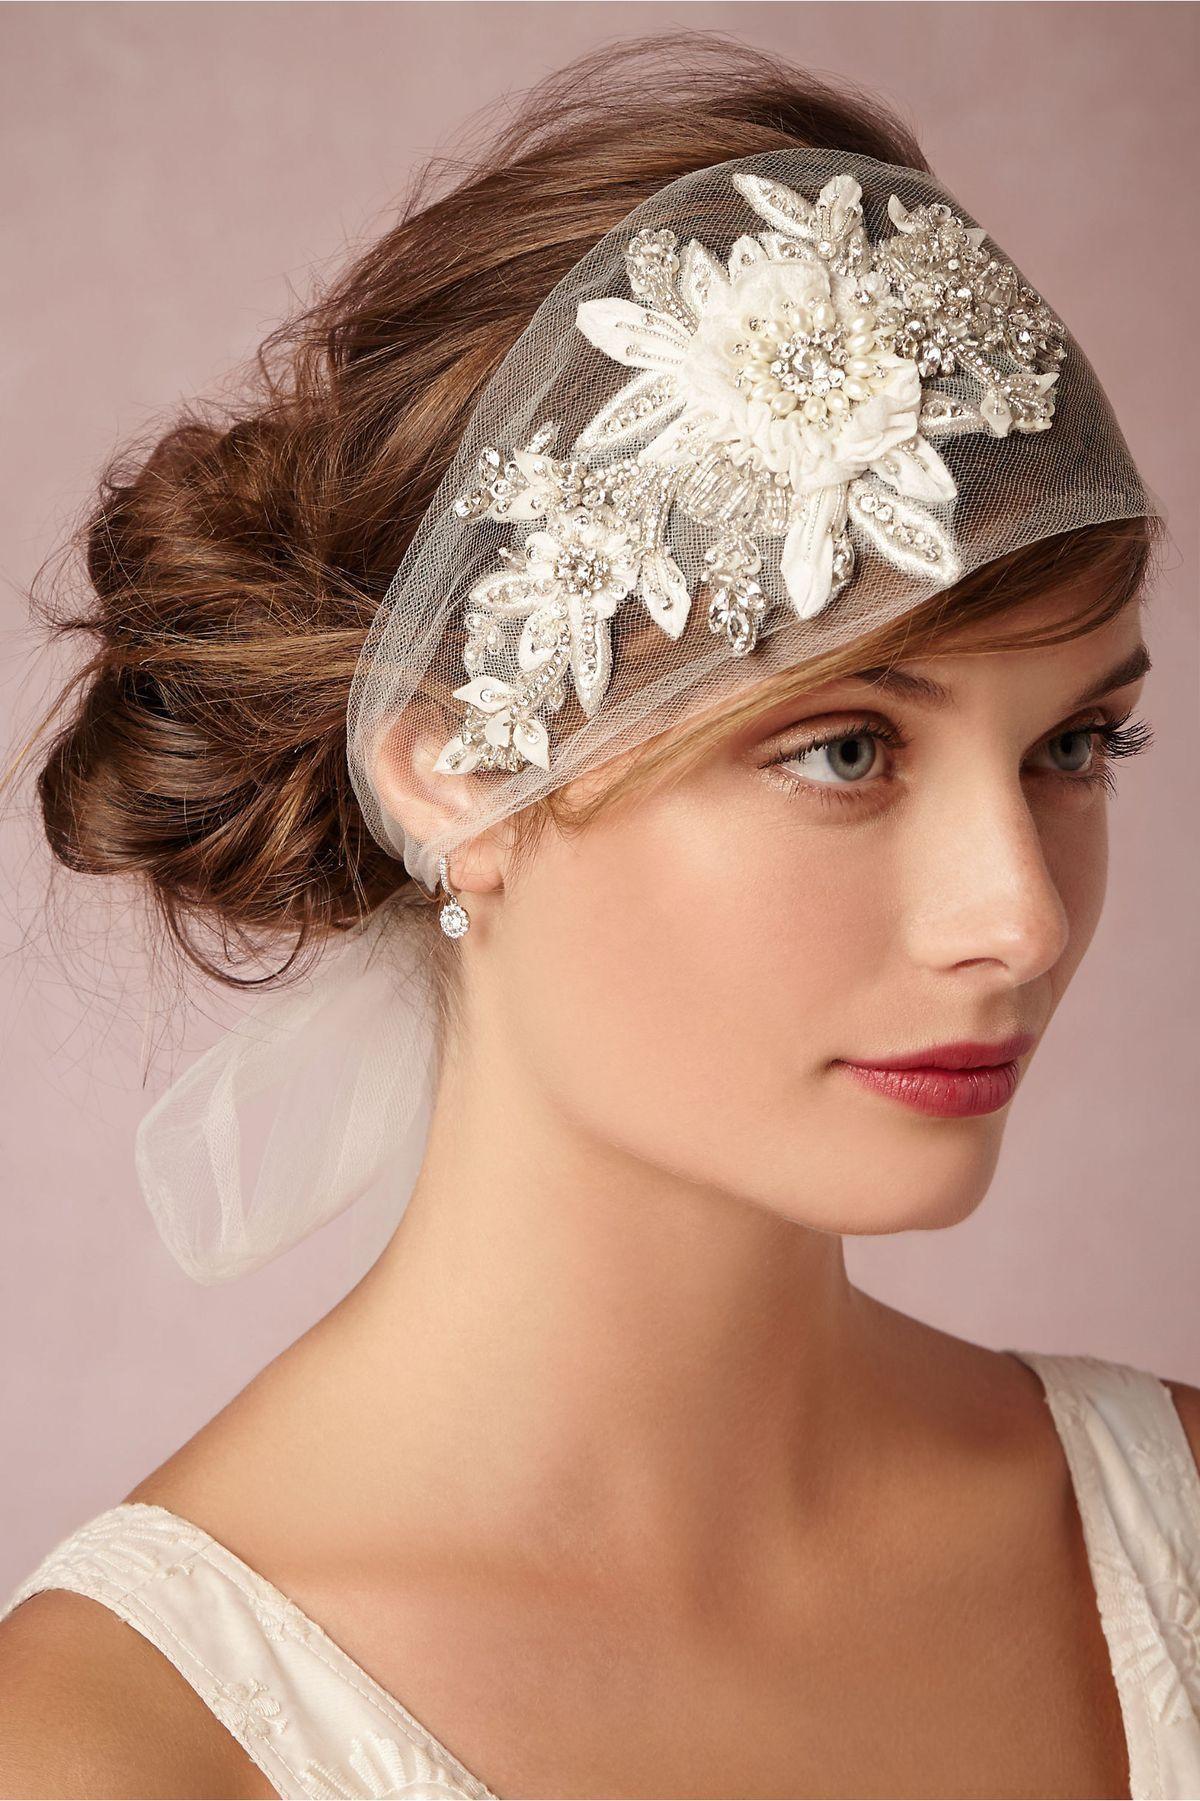 Fantastic semi juliet wedding veil headband with